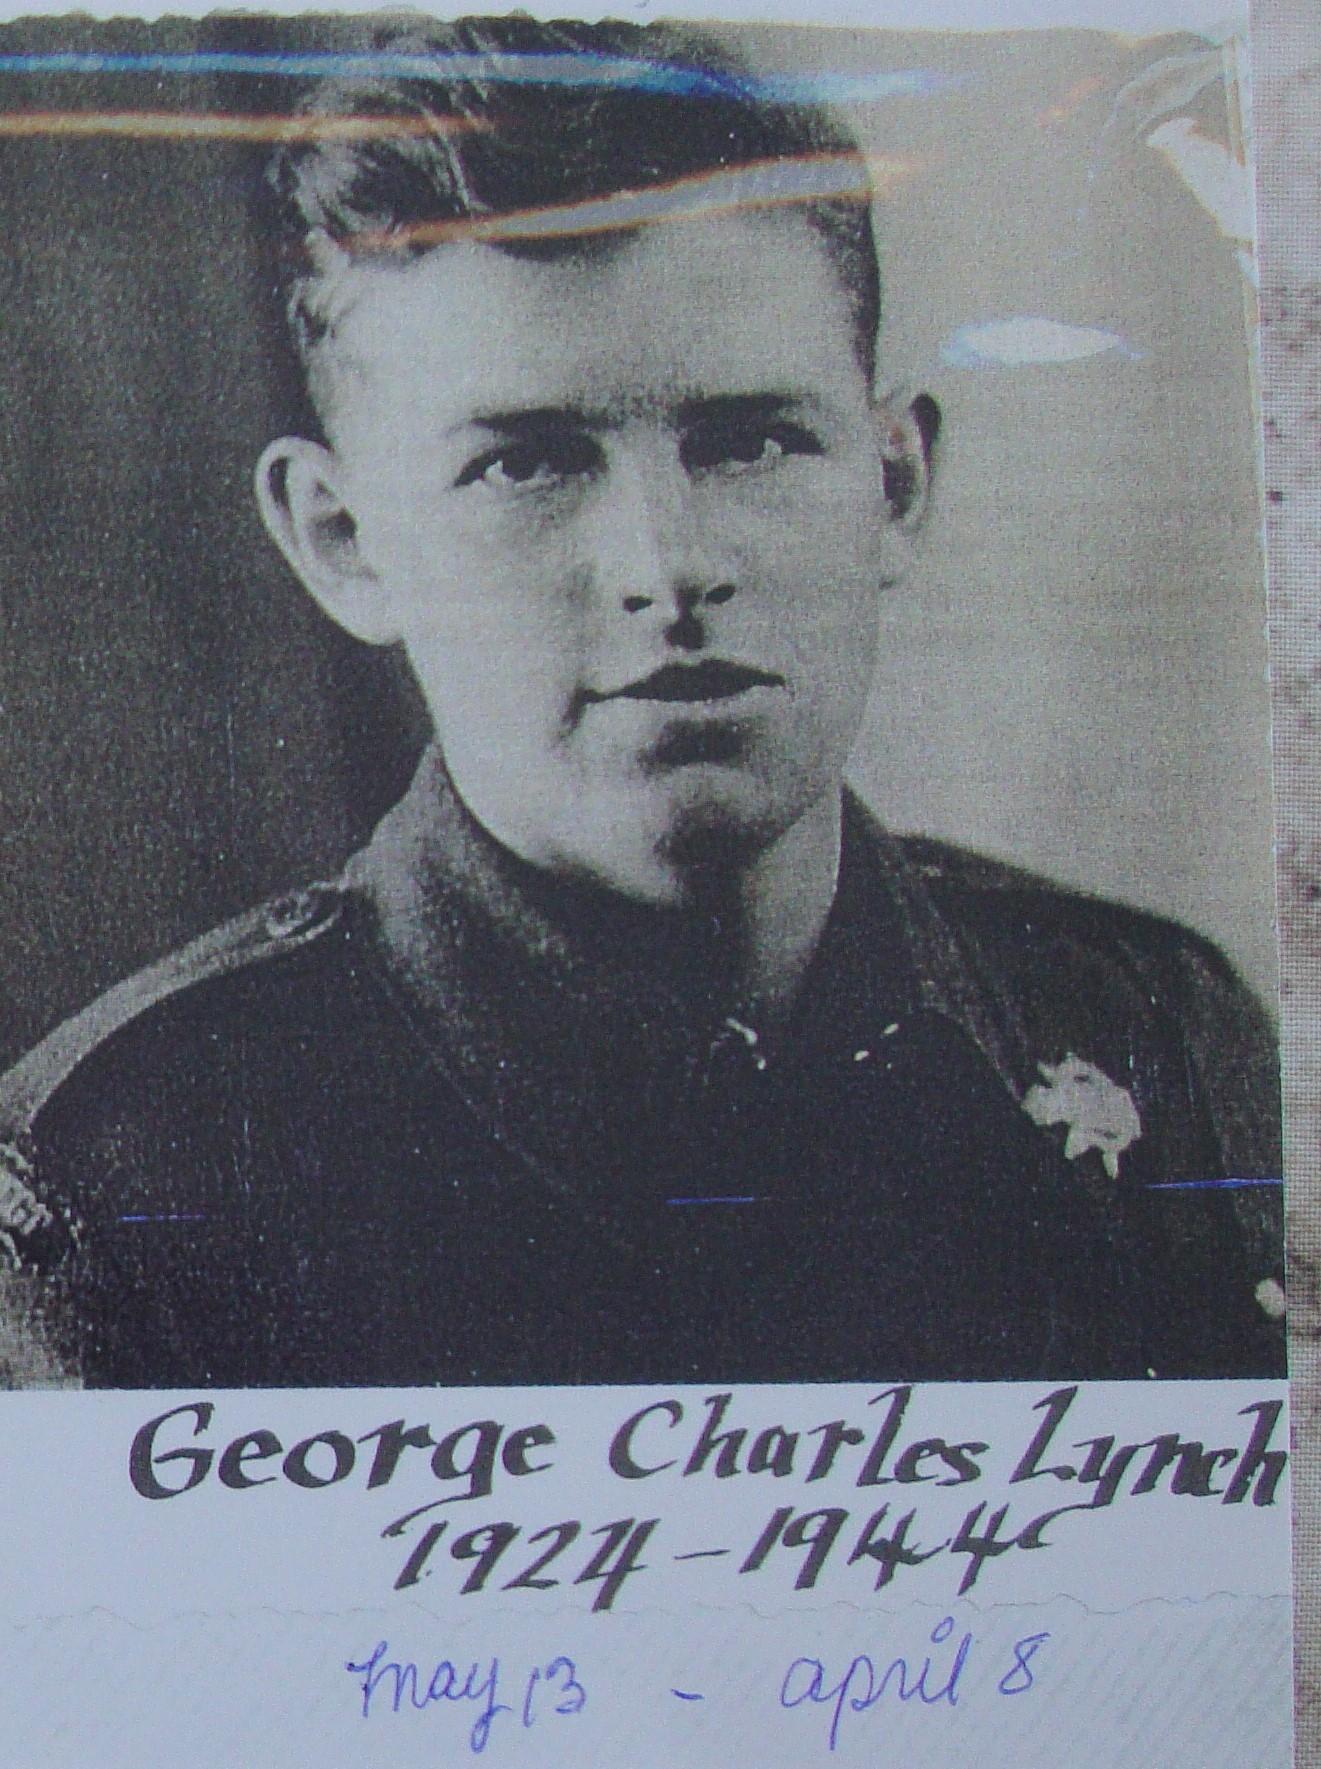 George Charles Lynch